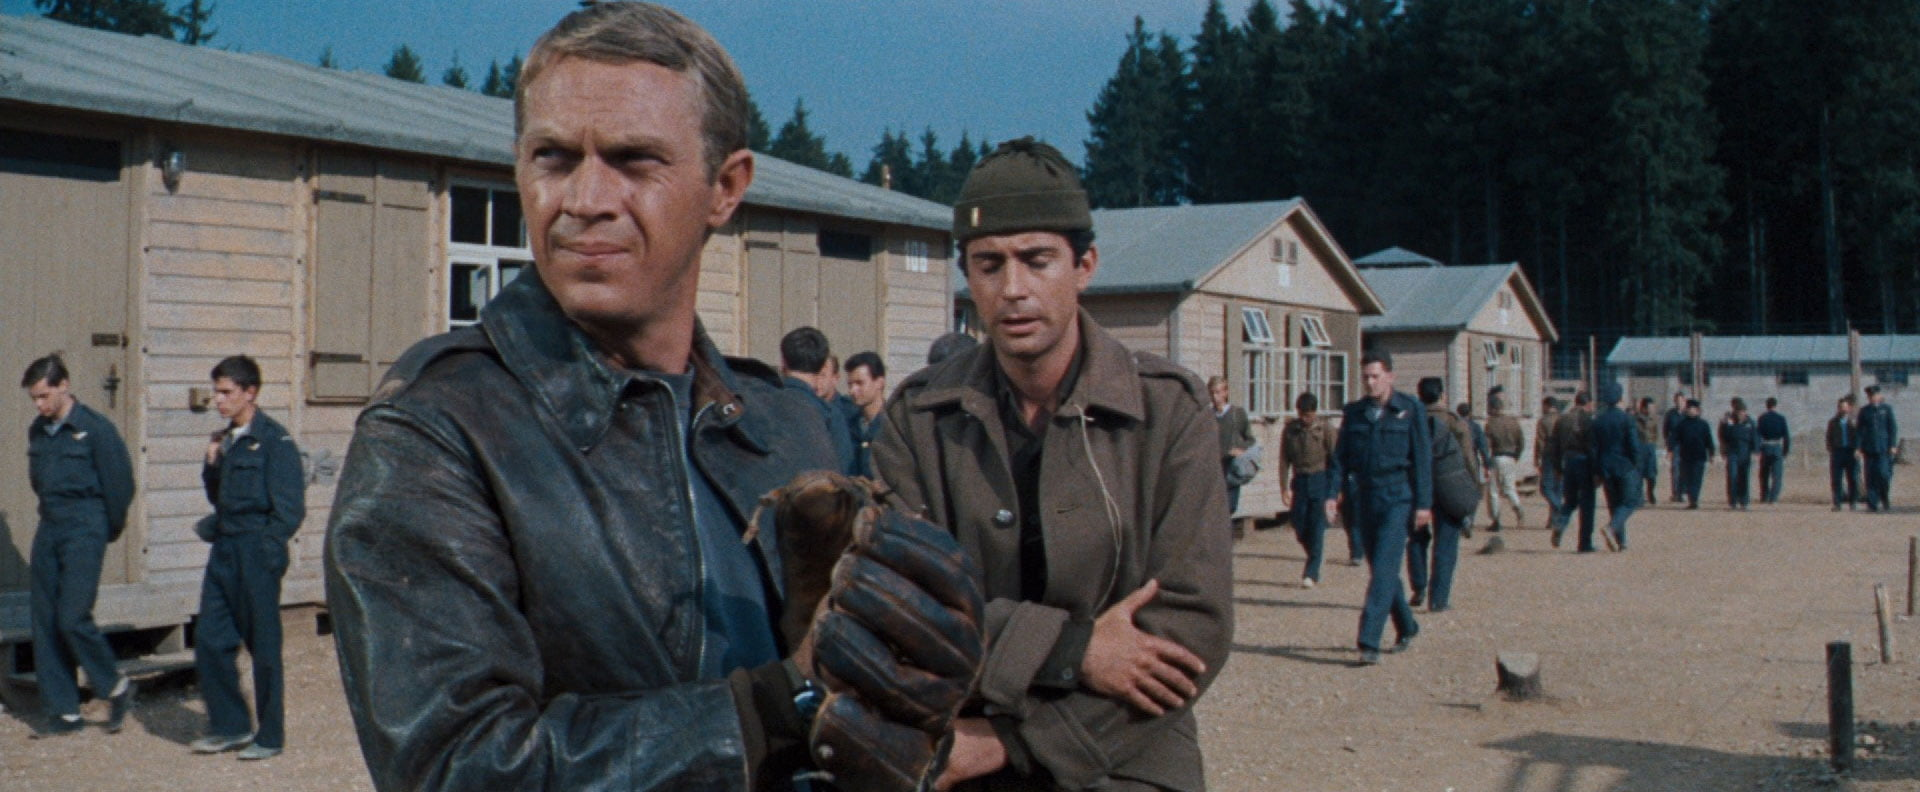 Велика втеча / The Great Escape (1963)